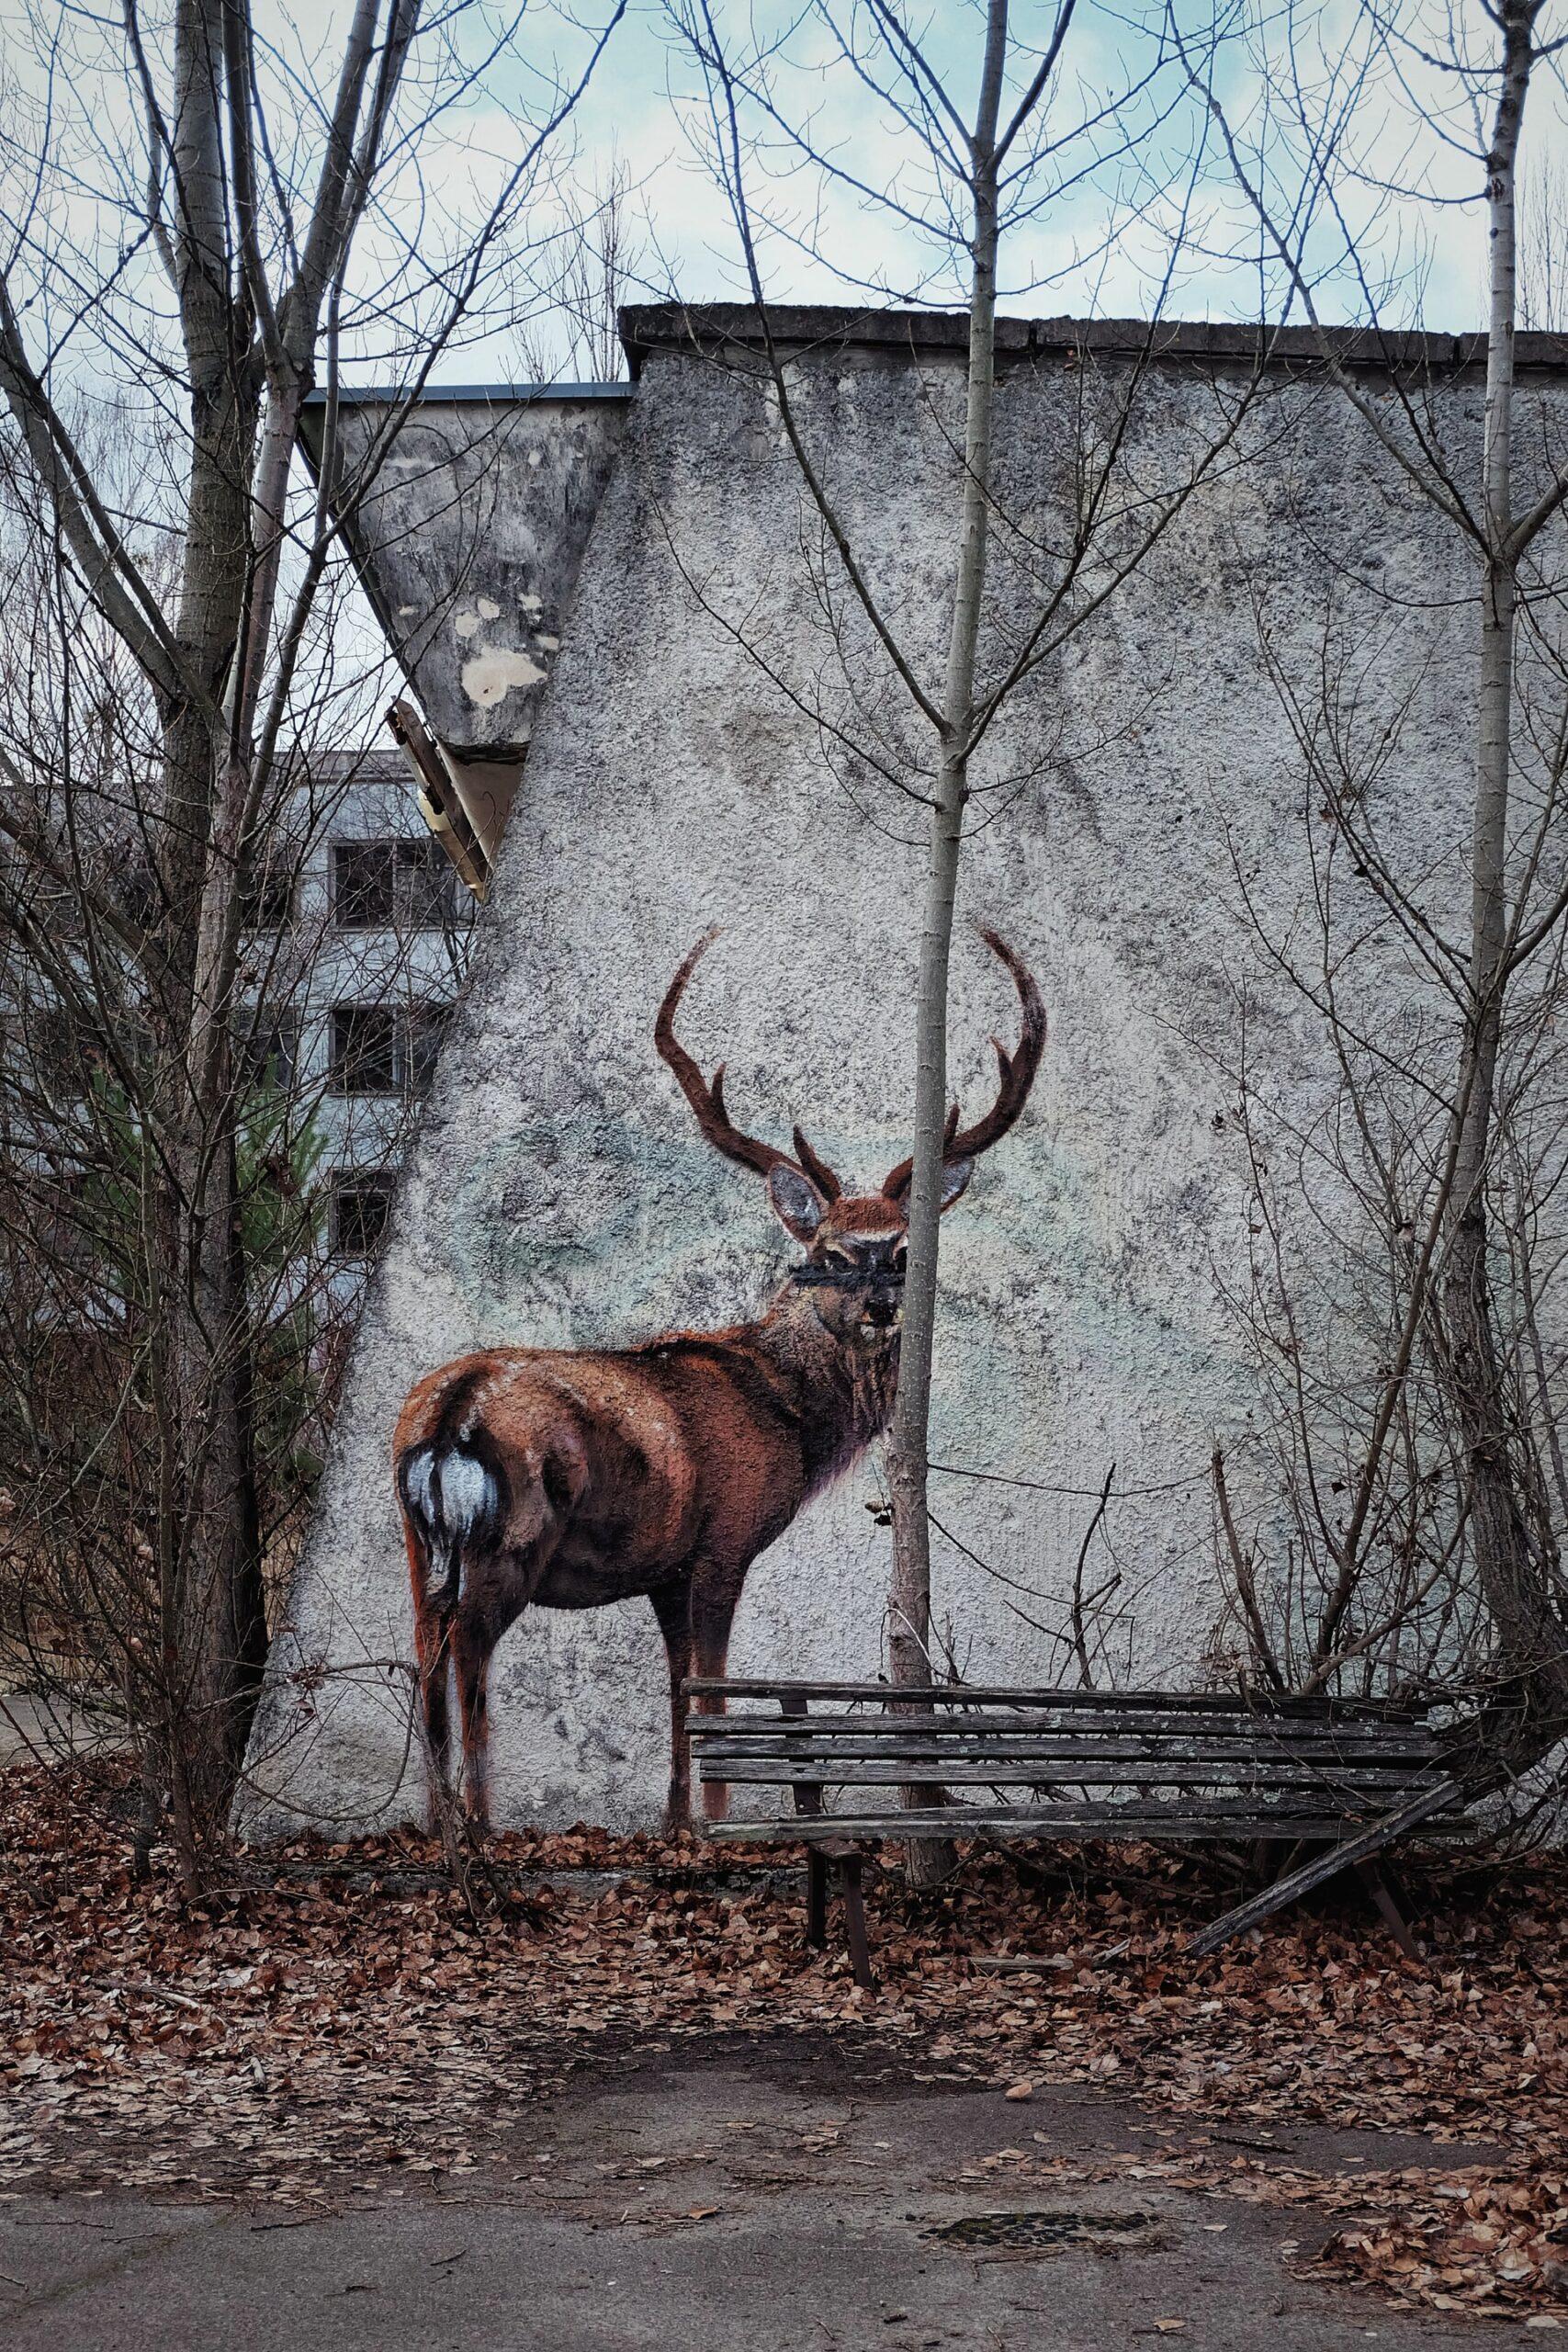 Chernobyl deer mural (photo: Oleksandra Bardash, Unsplash)